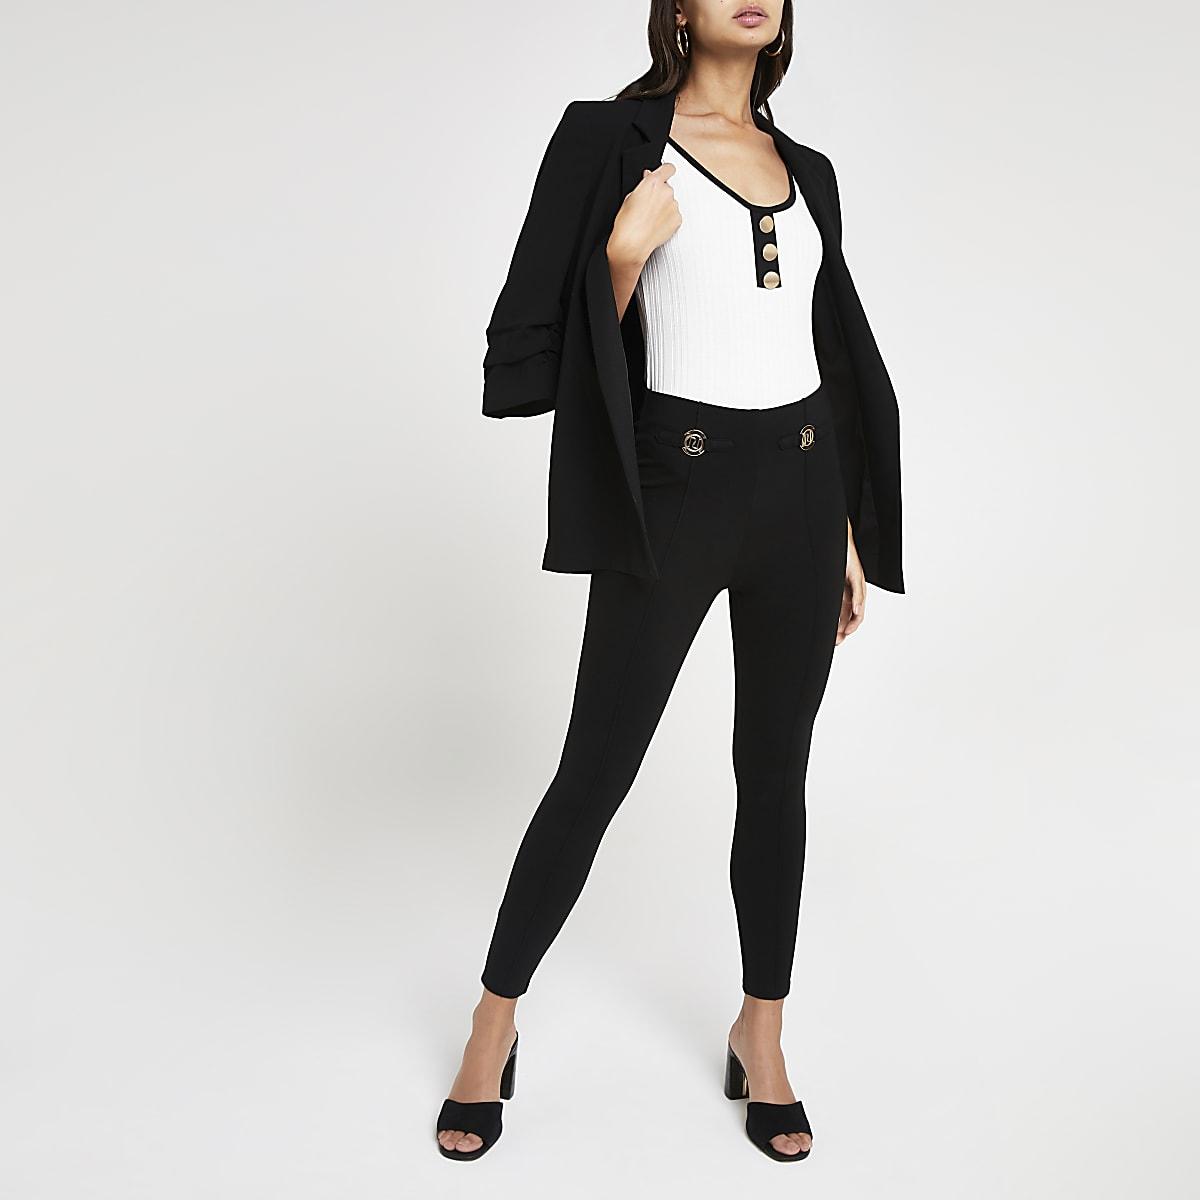 White ribbed monochrome bodysuit